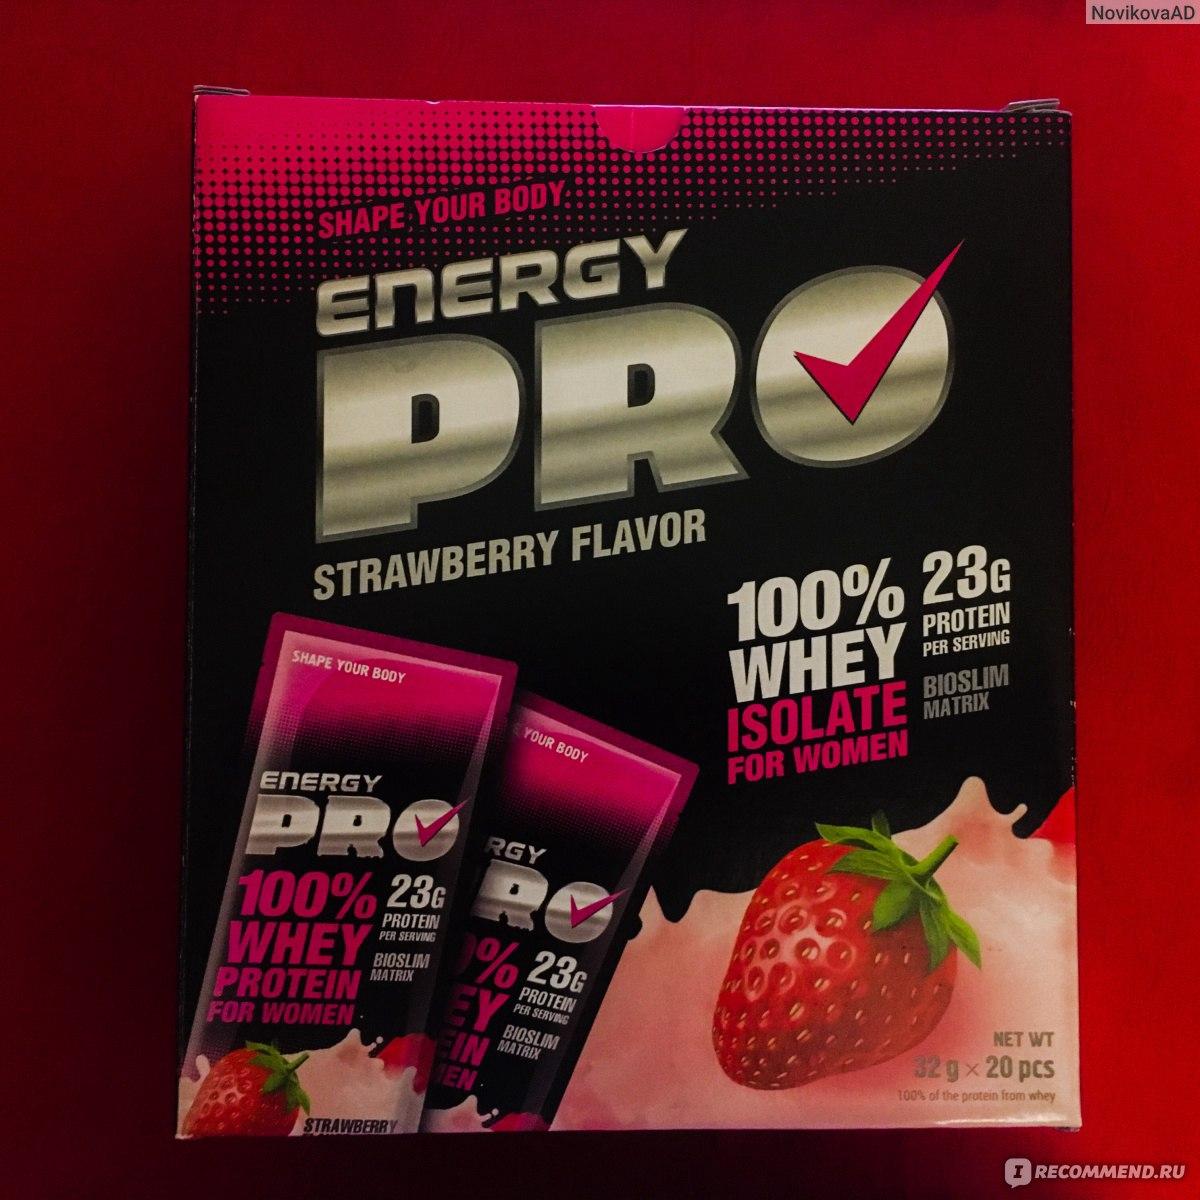 Полезен ли протеин для похудения девушкам? | promusculus.ru